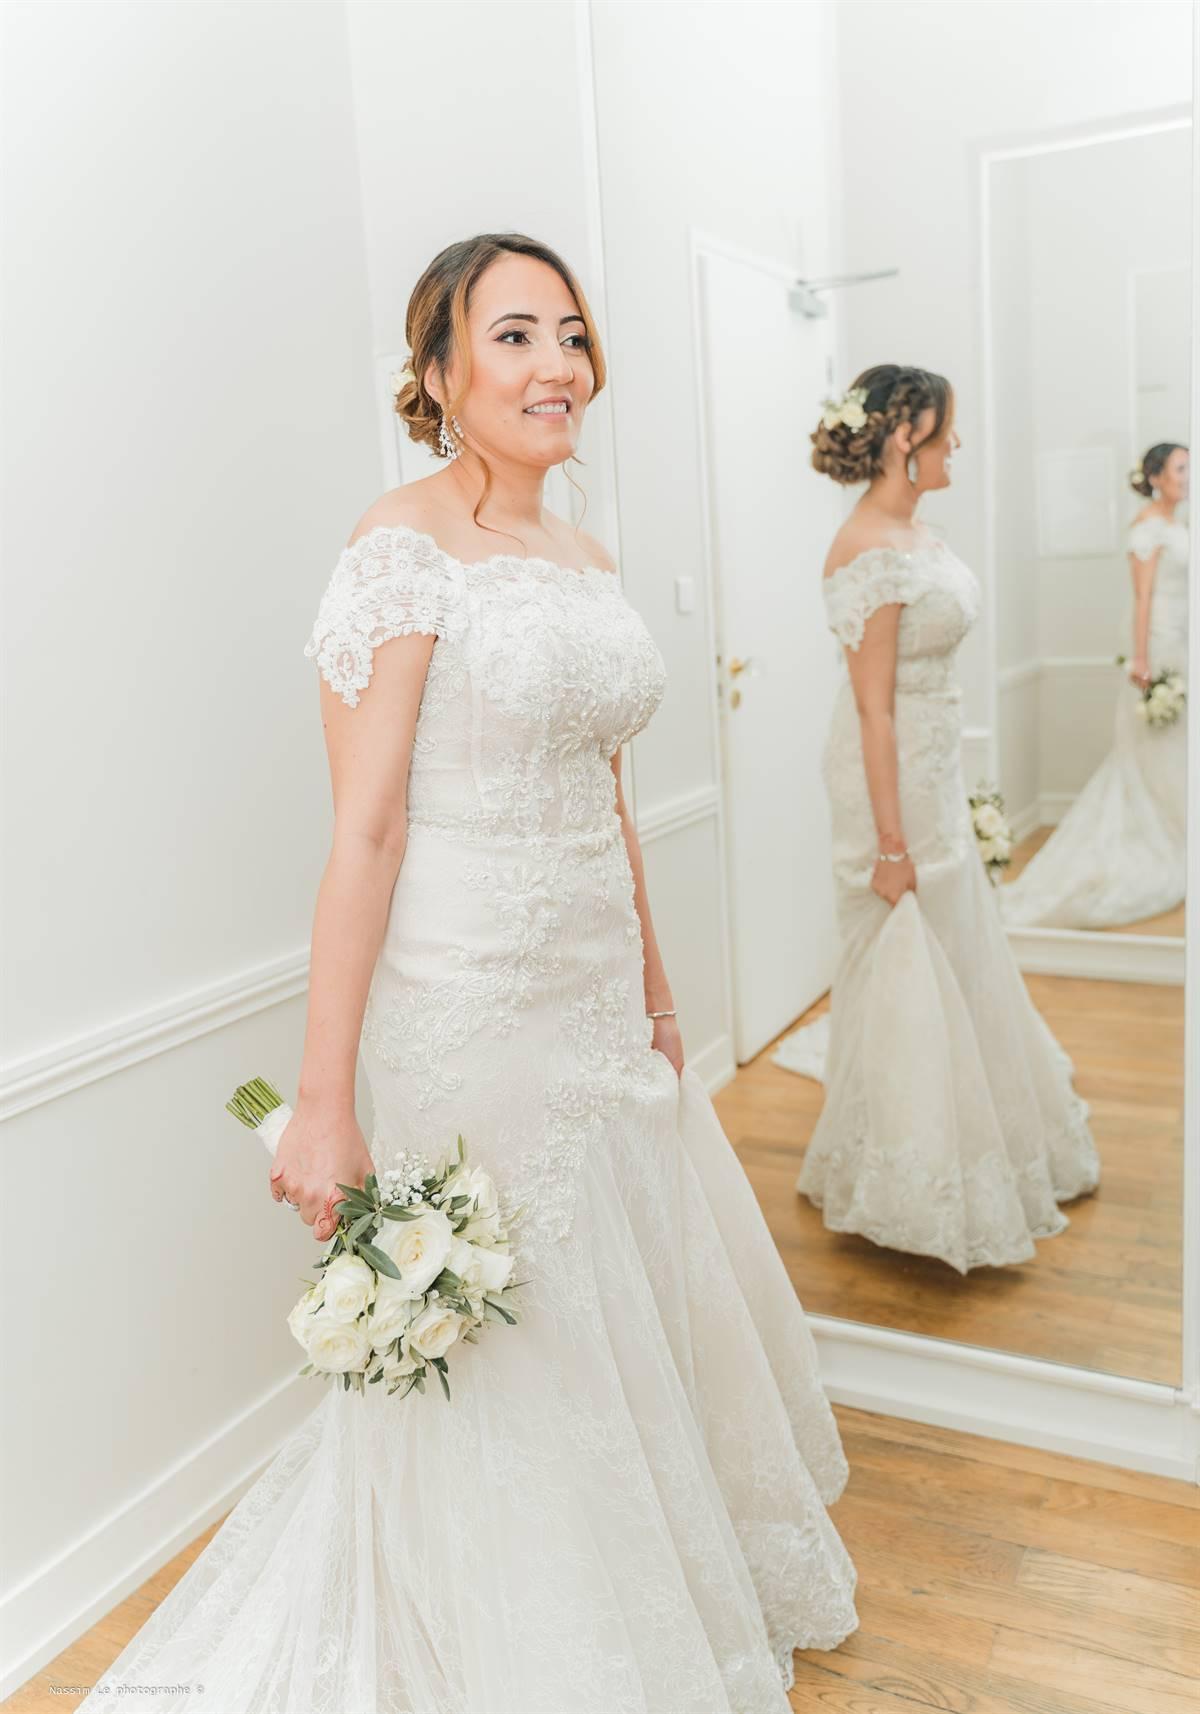 Pourquoi choisir ce Photographe mariage oriental 116